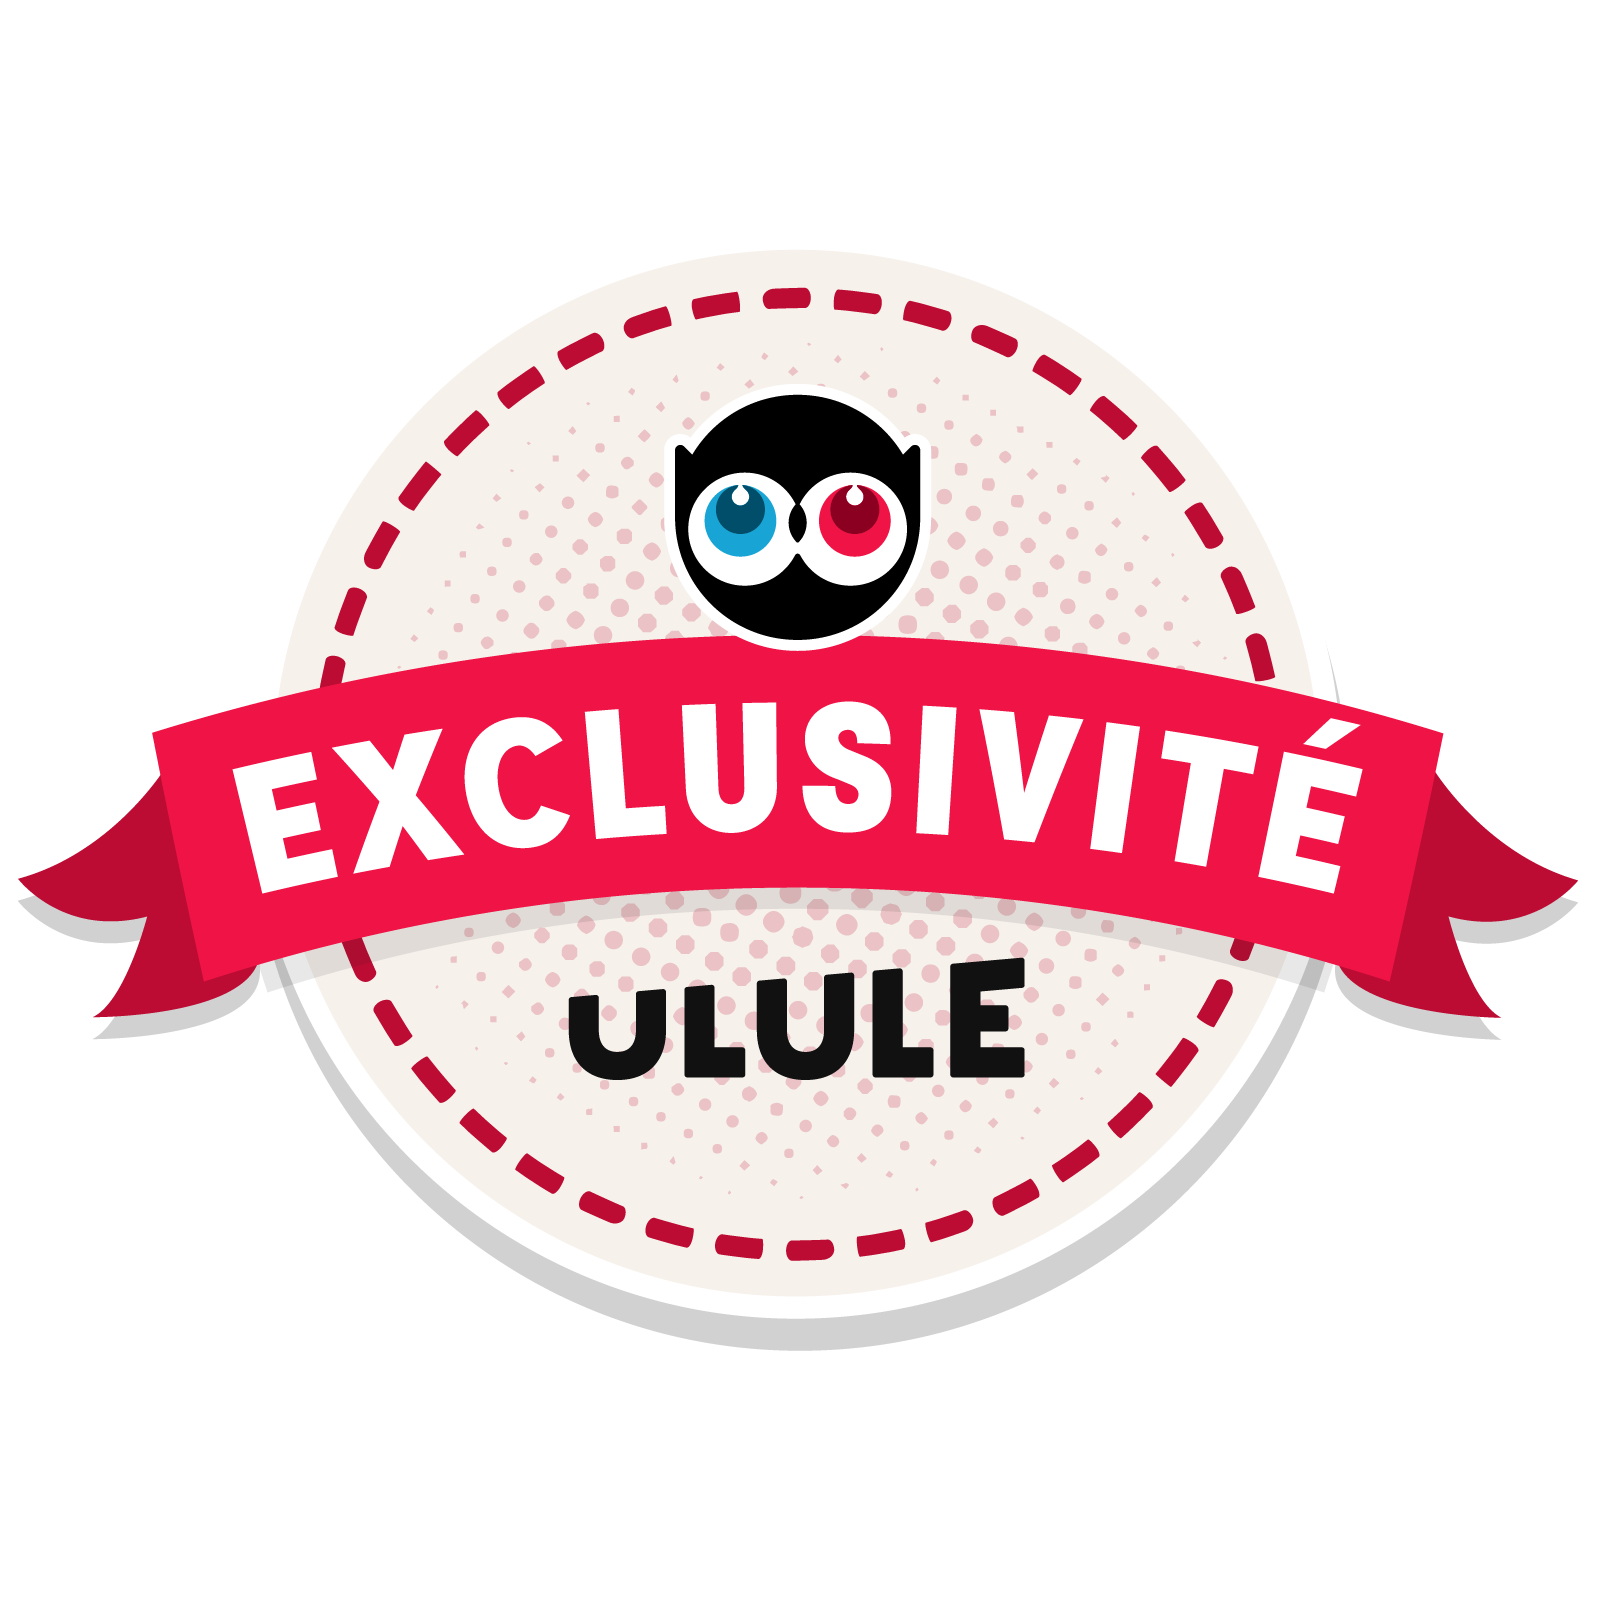 L'Atelier de Béryl - Ulule - Exclusivité